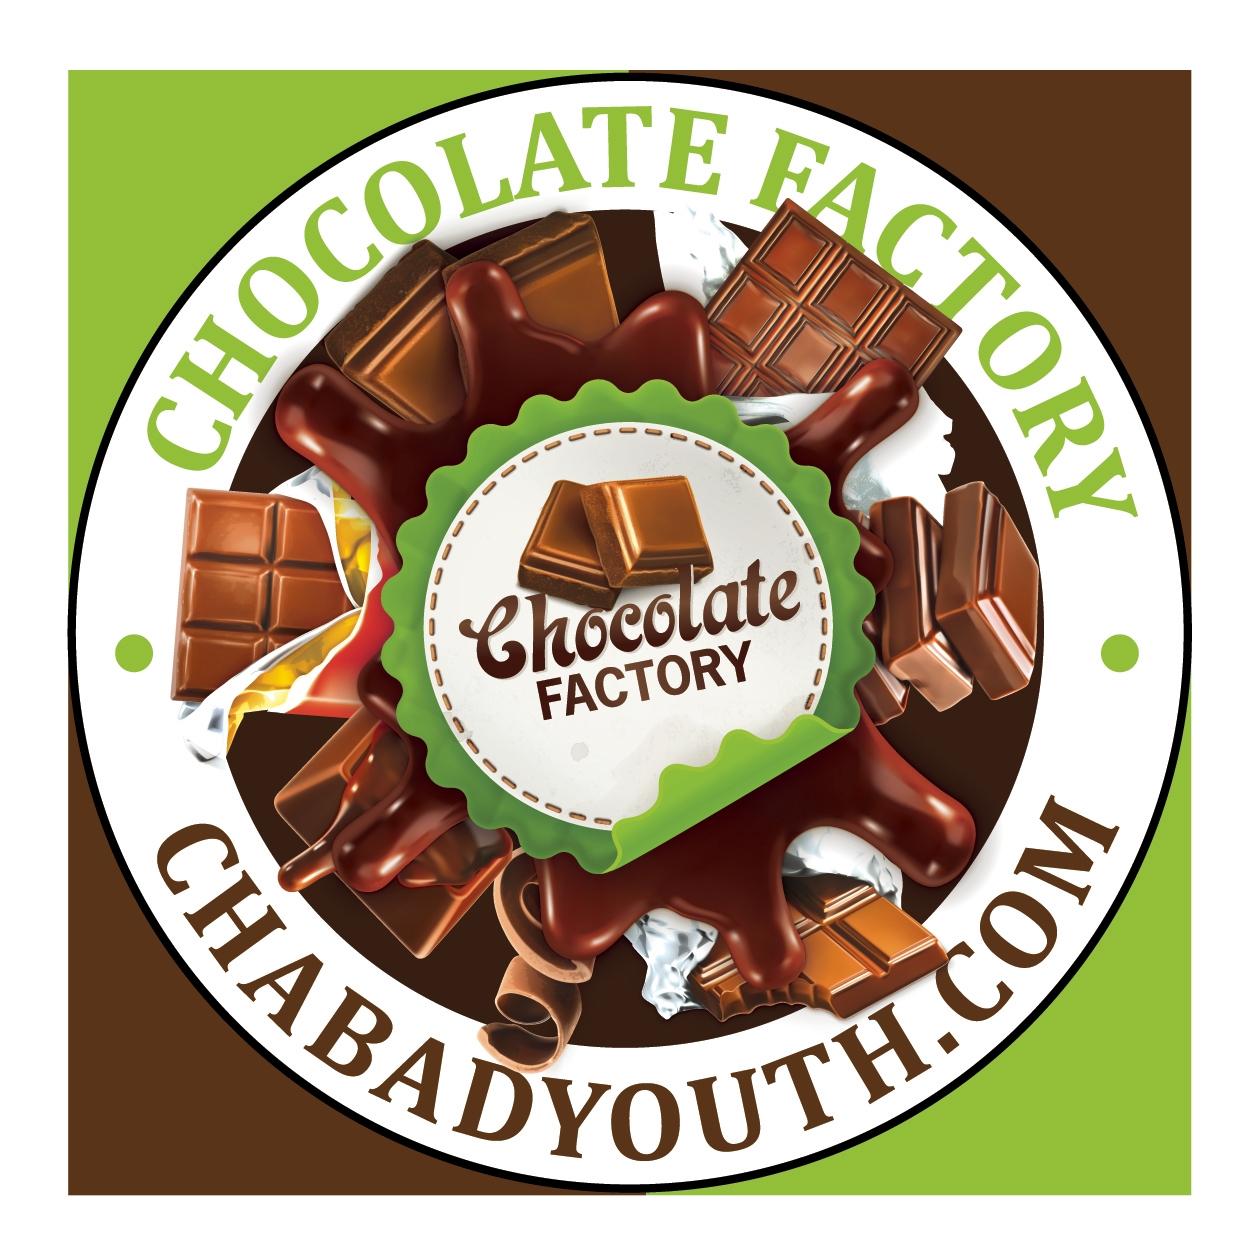 ChocolateFactory_ChabadYouth.jpg